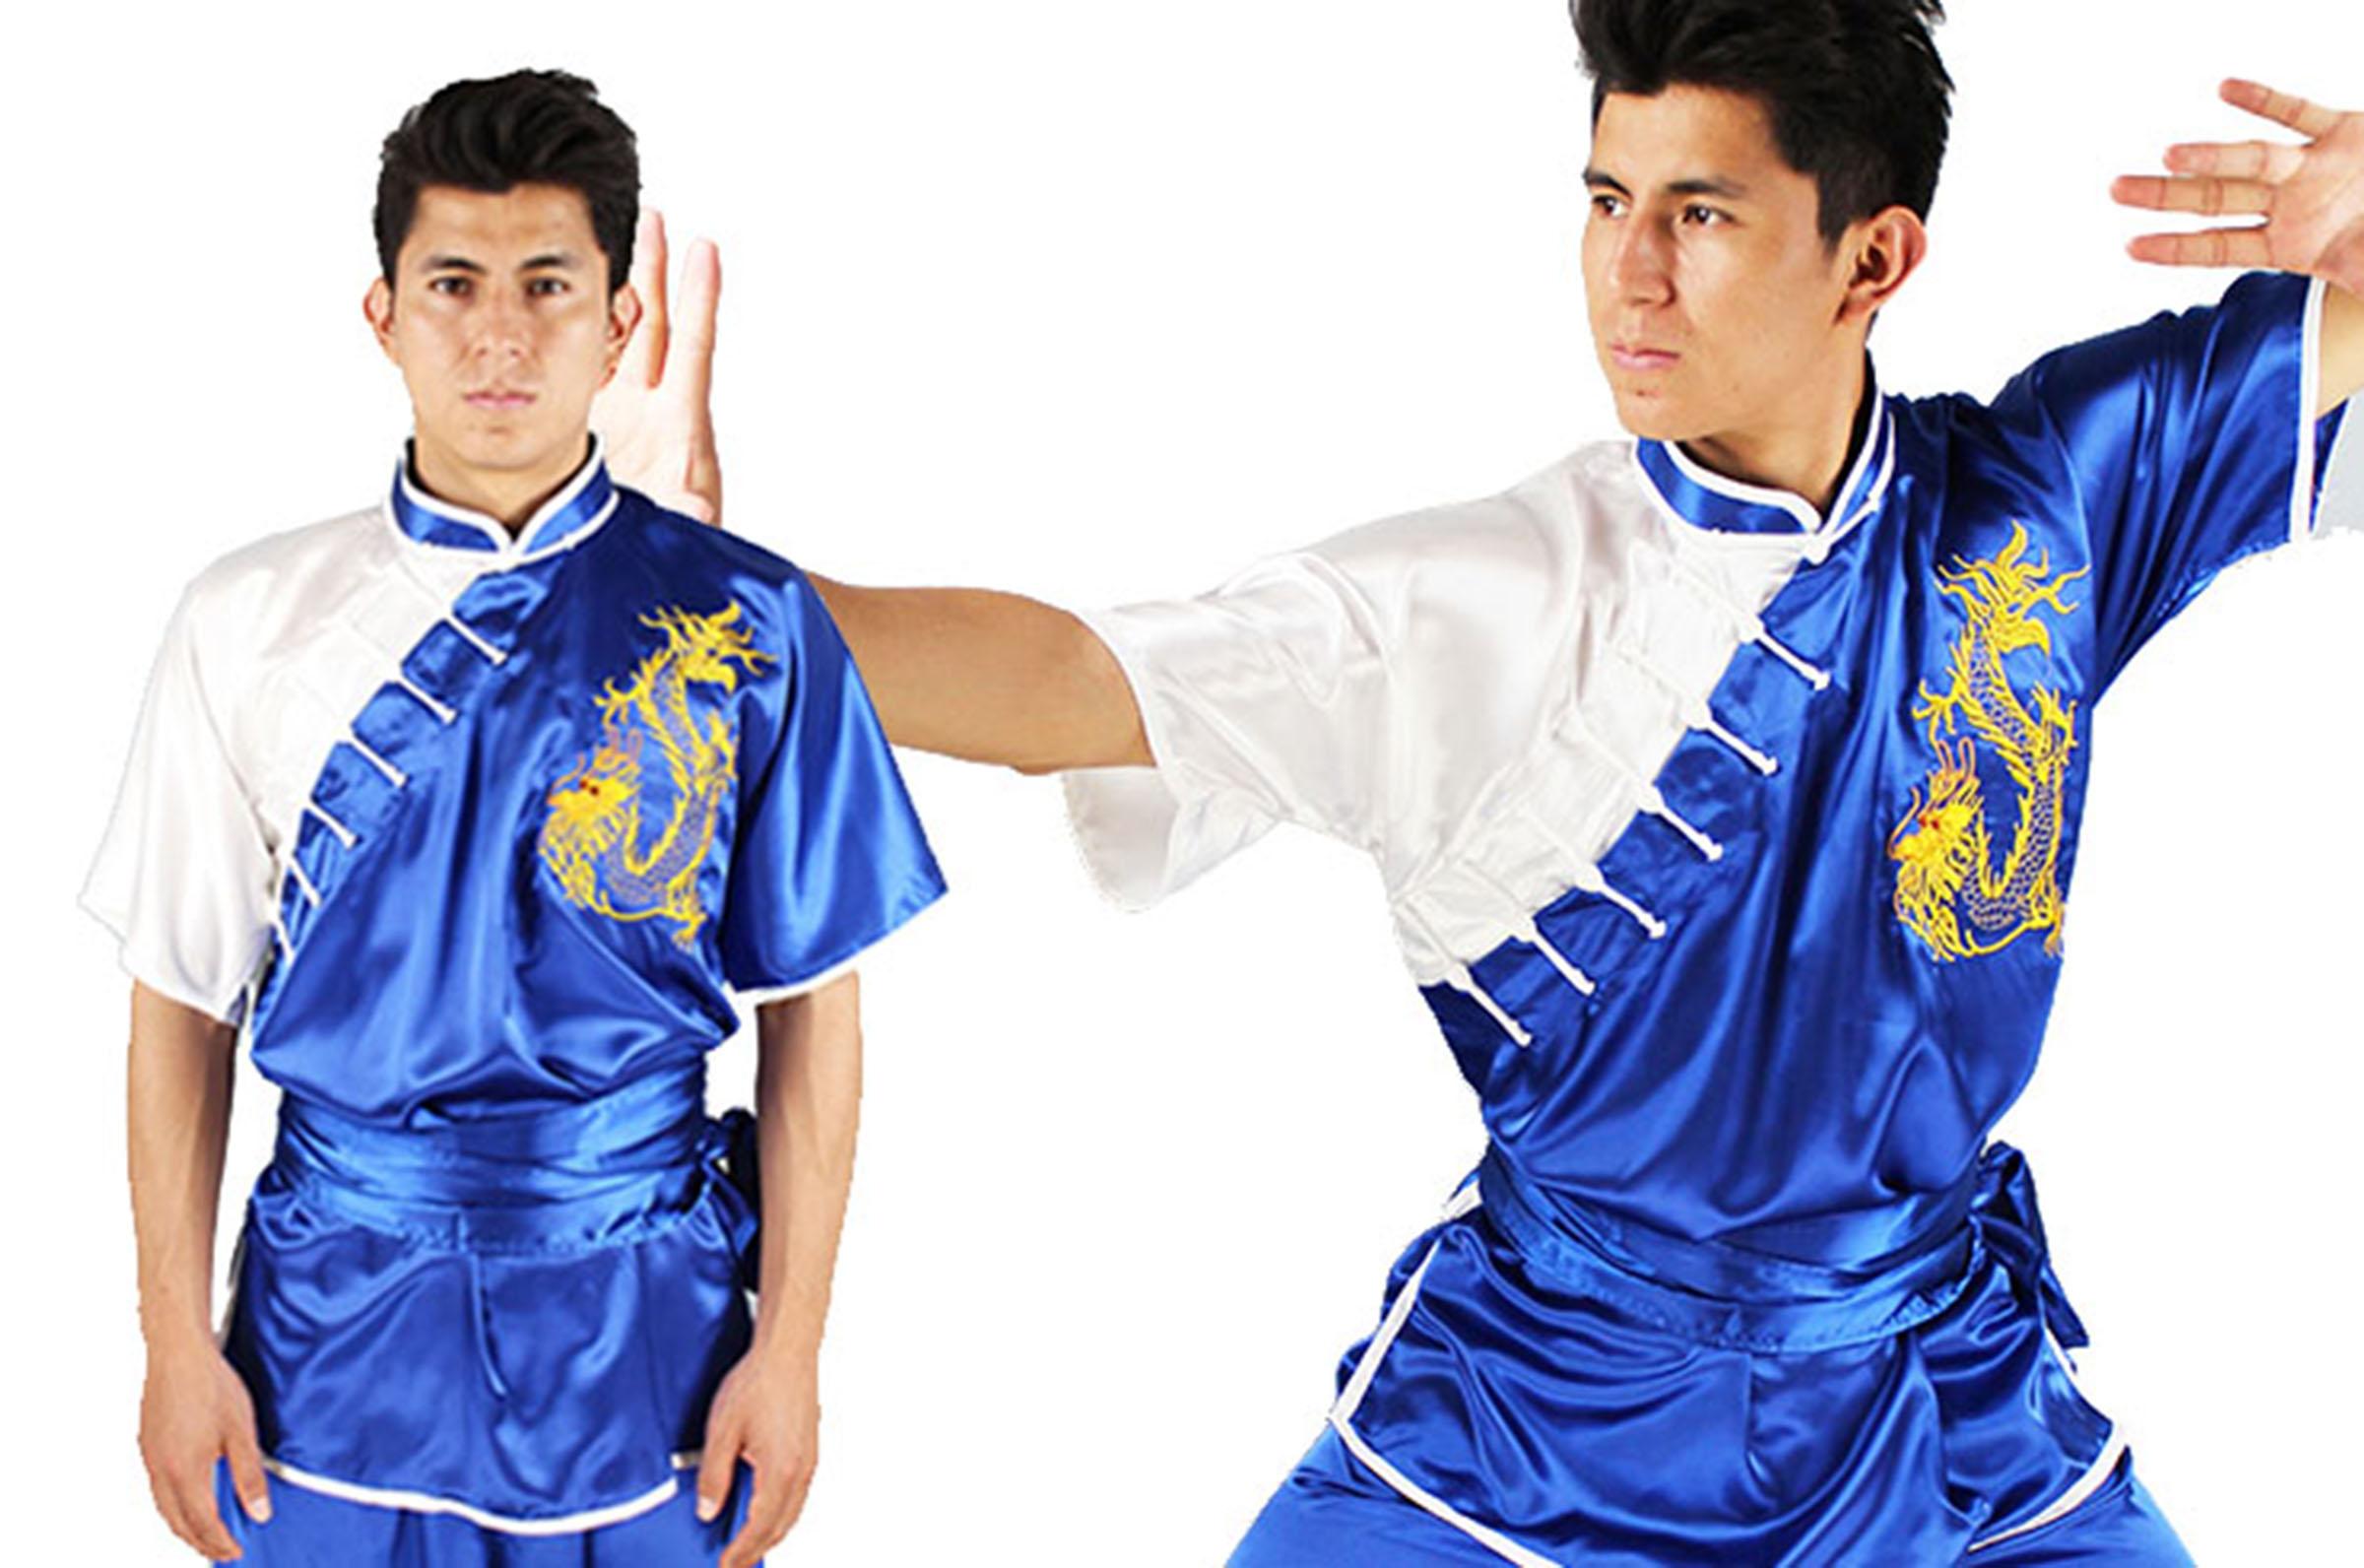 Sporting Goods Uniforme Kimono Kung Fu Chang Quan Shan Xi Amarillo Drago Bordado